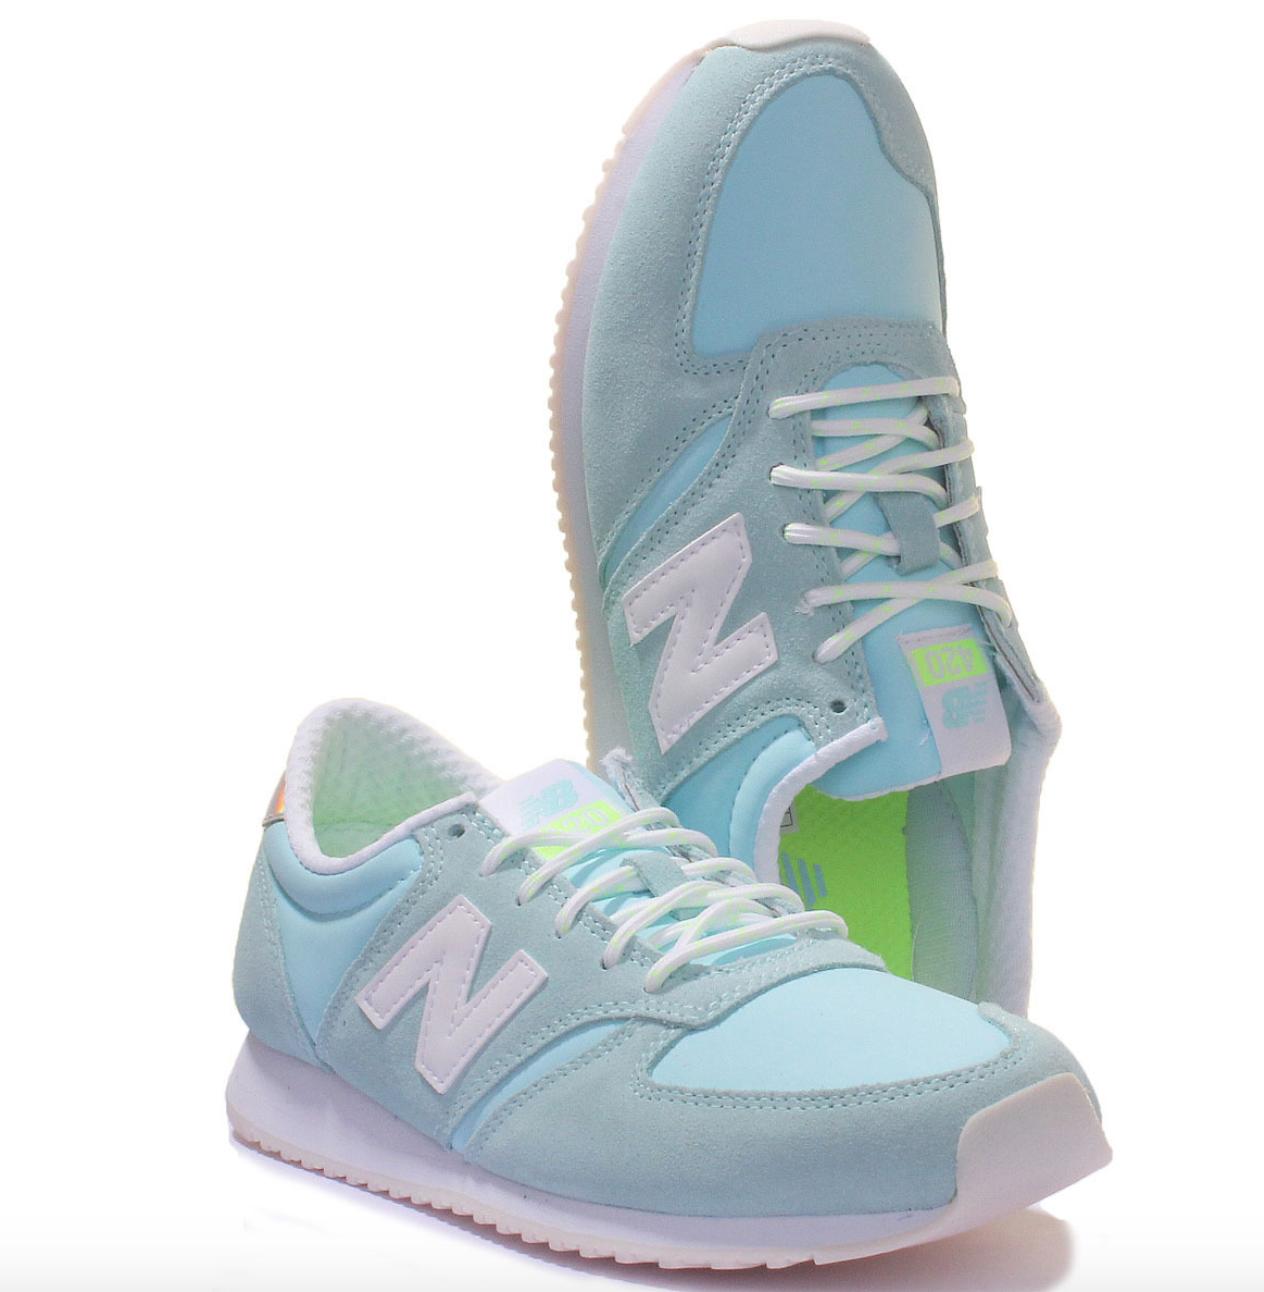 New New New Balance 420AZ Classic blu scarpe da ginnastica 1172 Dimensione 8 B afa3db